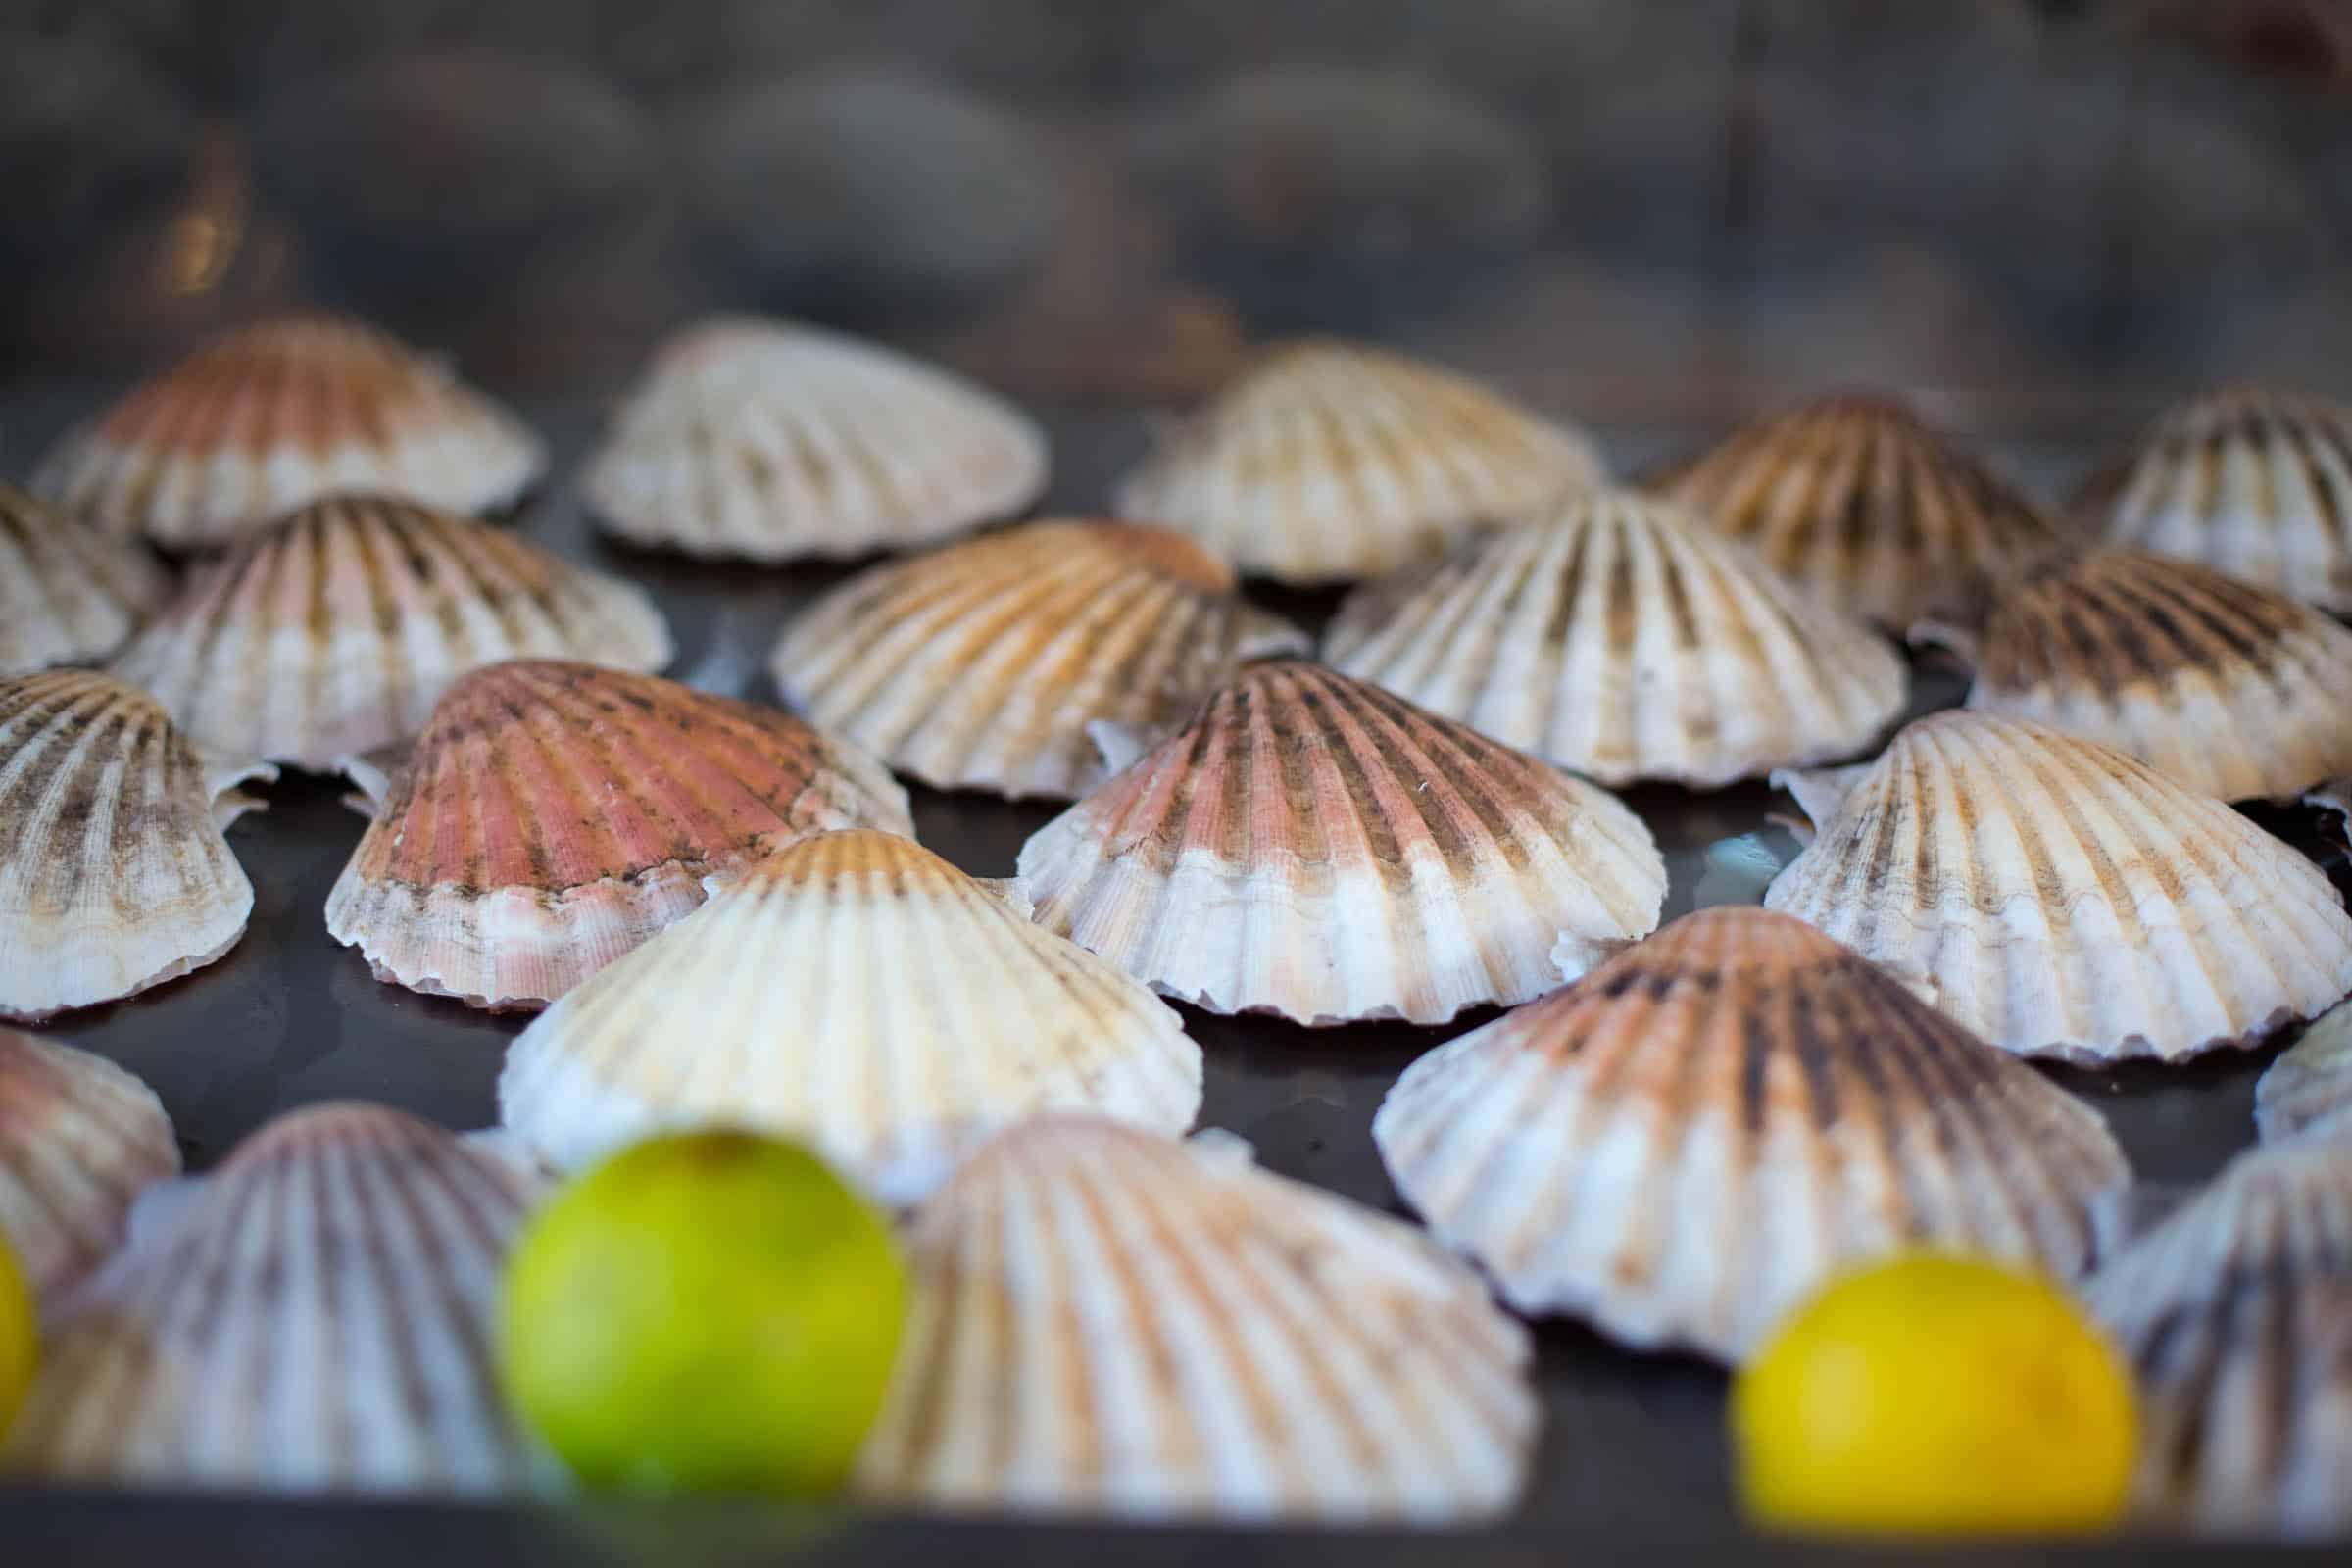 fruits de mer crustacés restaurant casamar guethary pays basque landes bar tapas à emporter